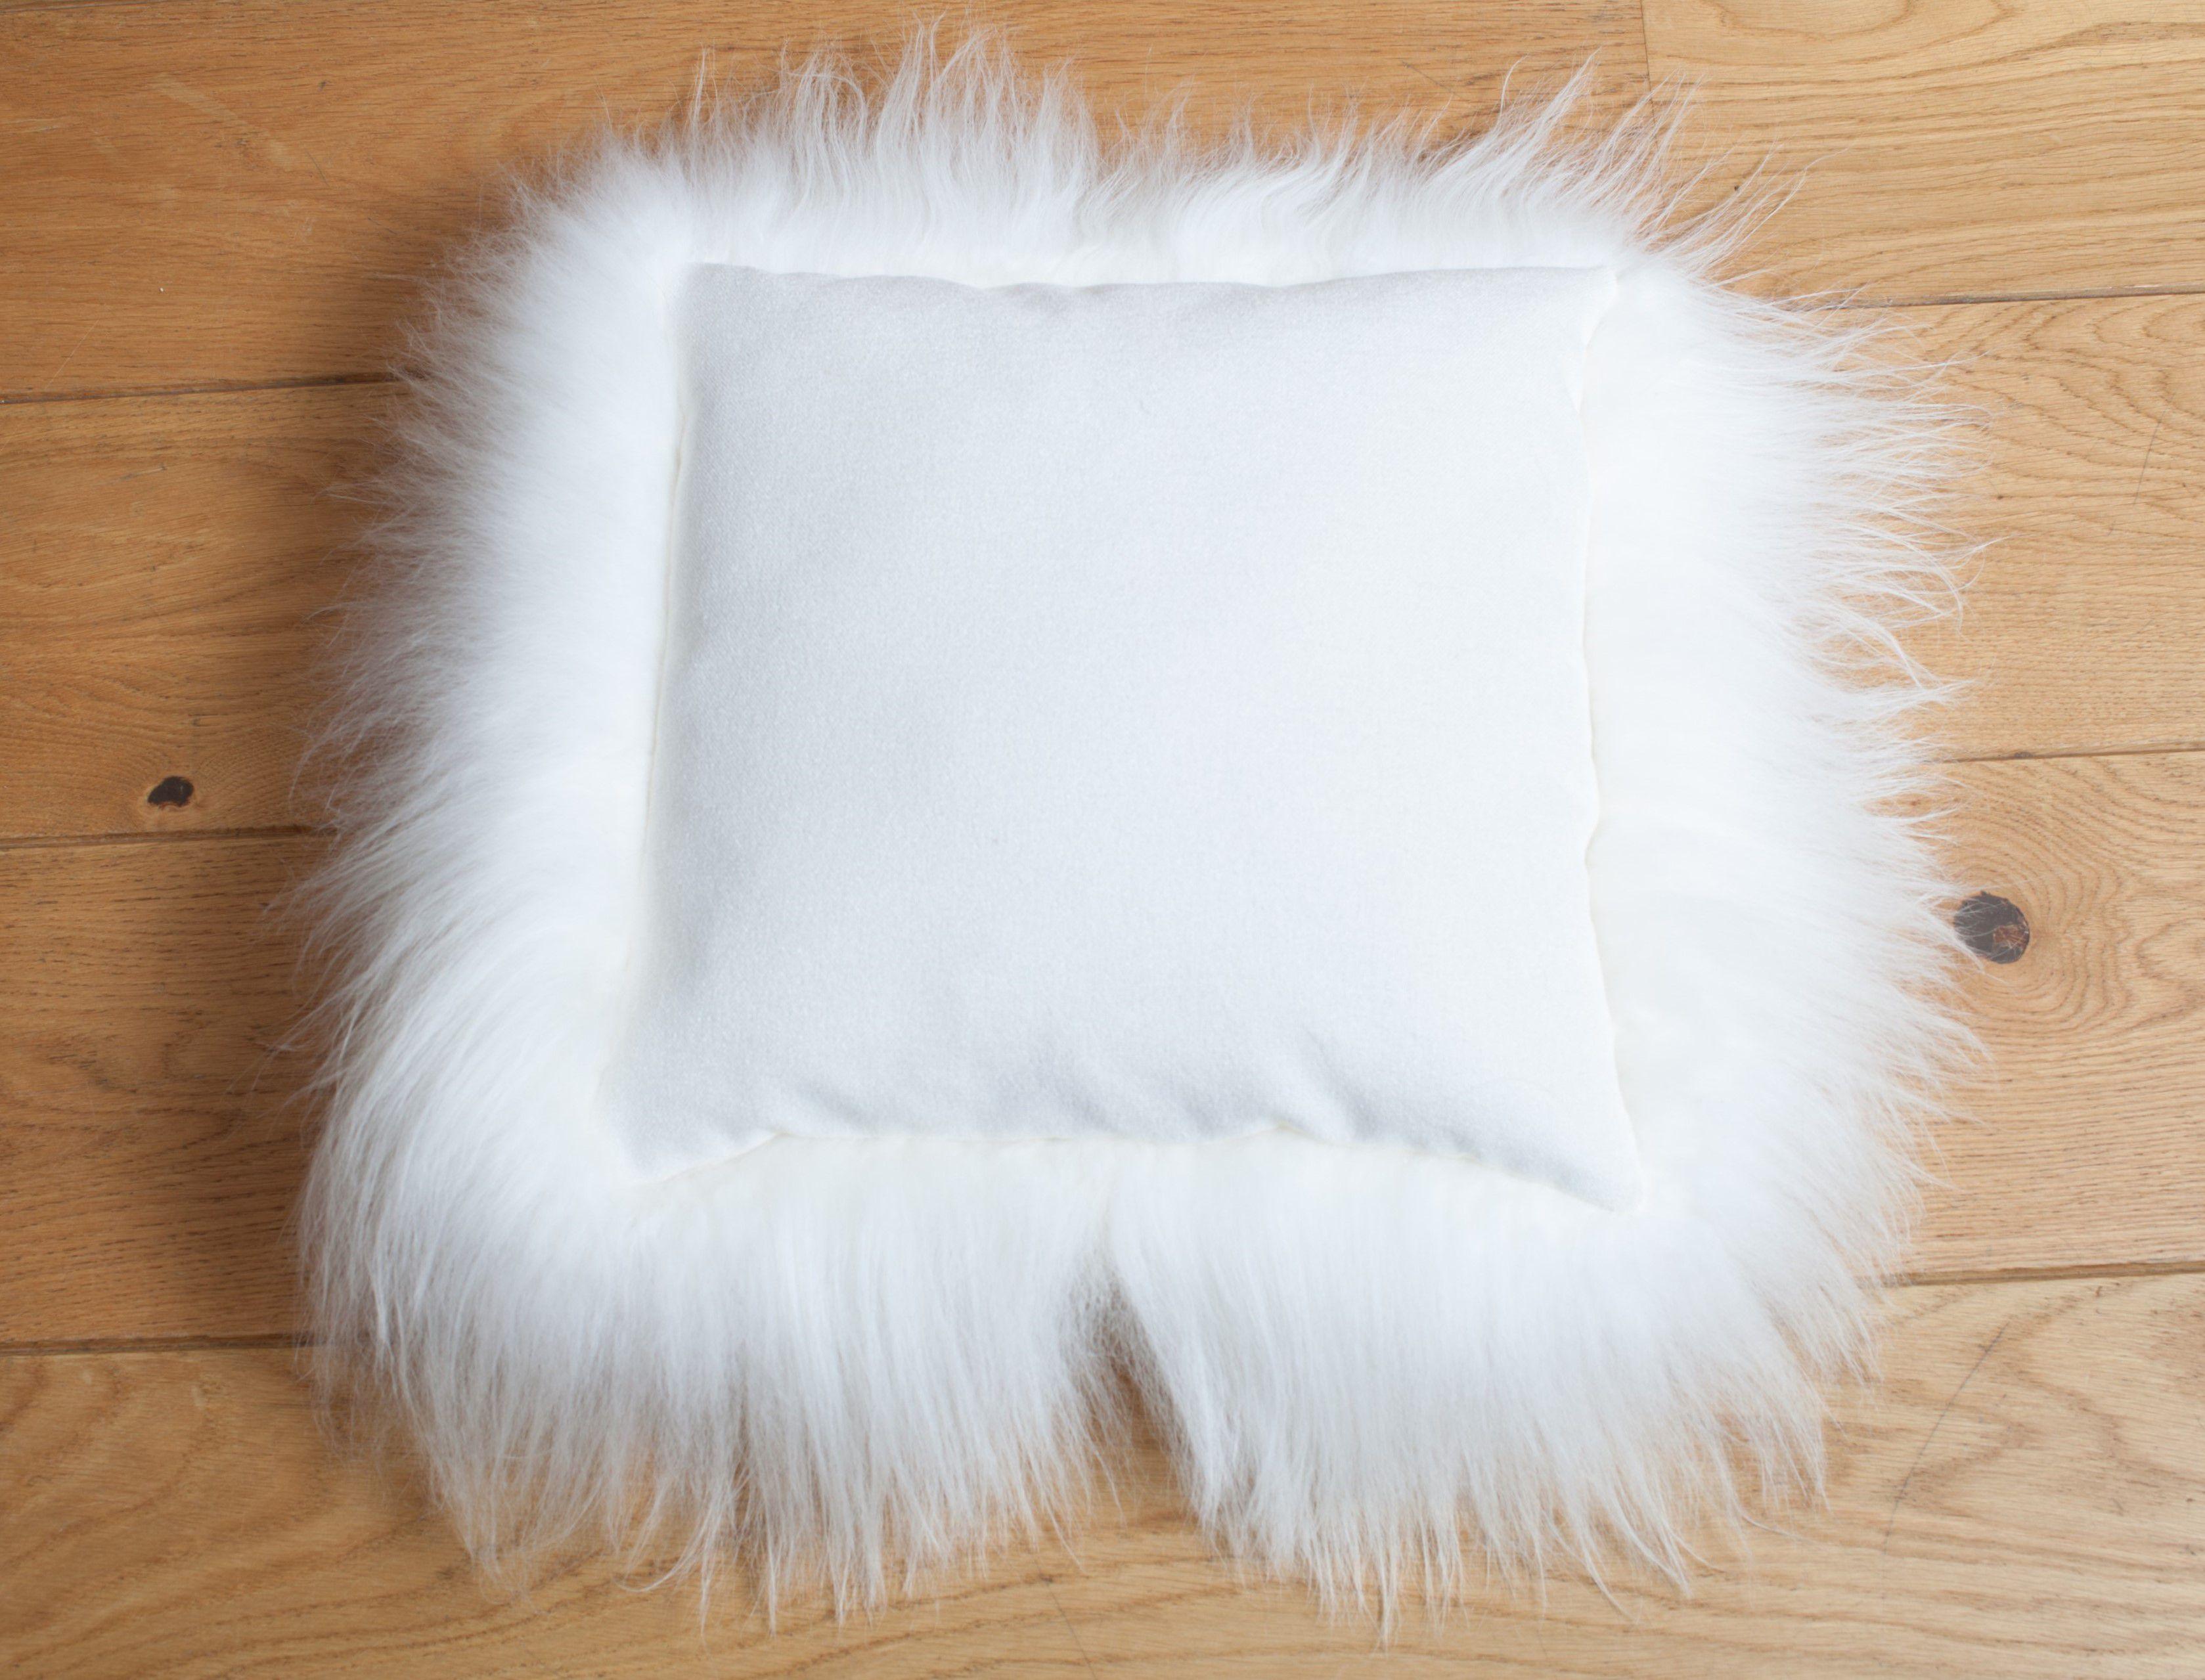 Sheepskin Cushion Long White with Fabric